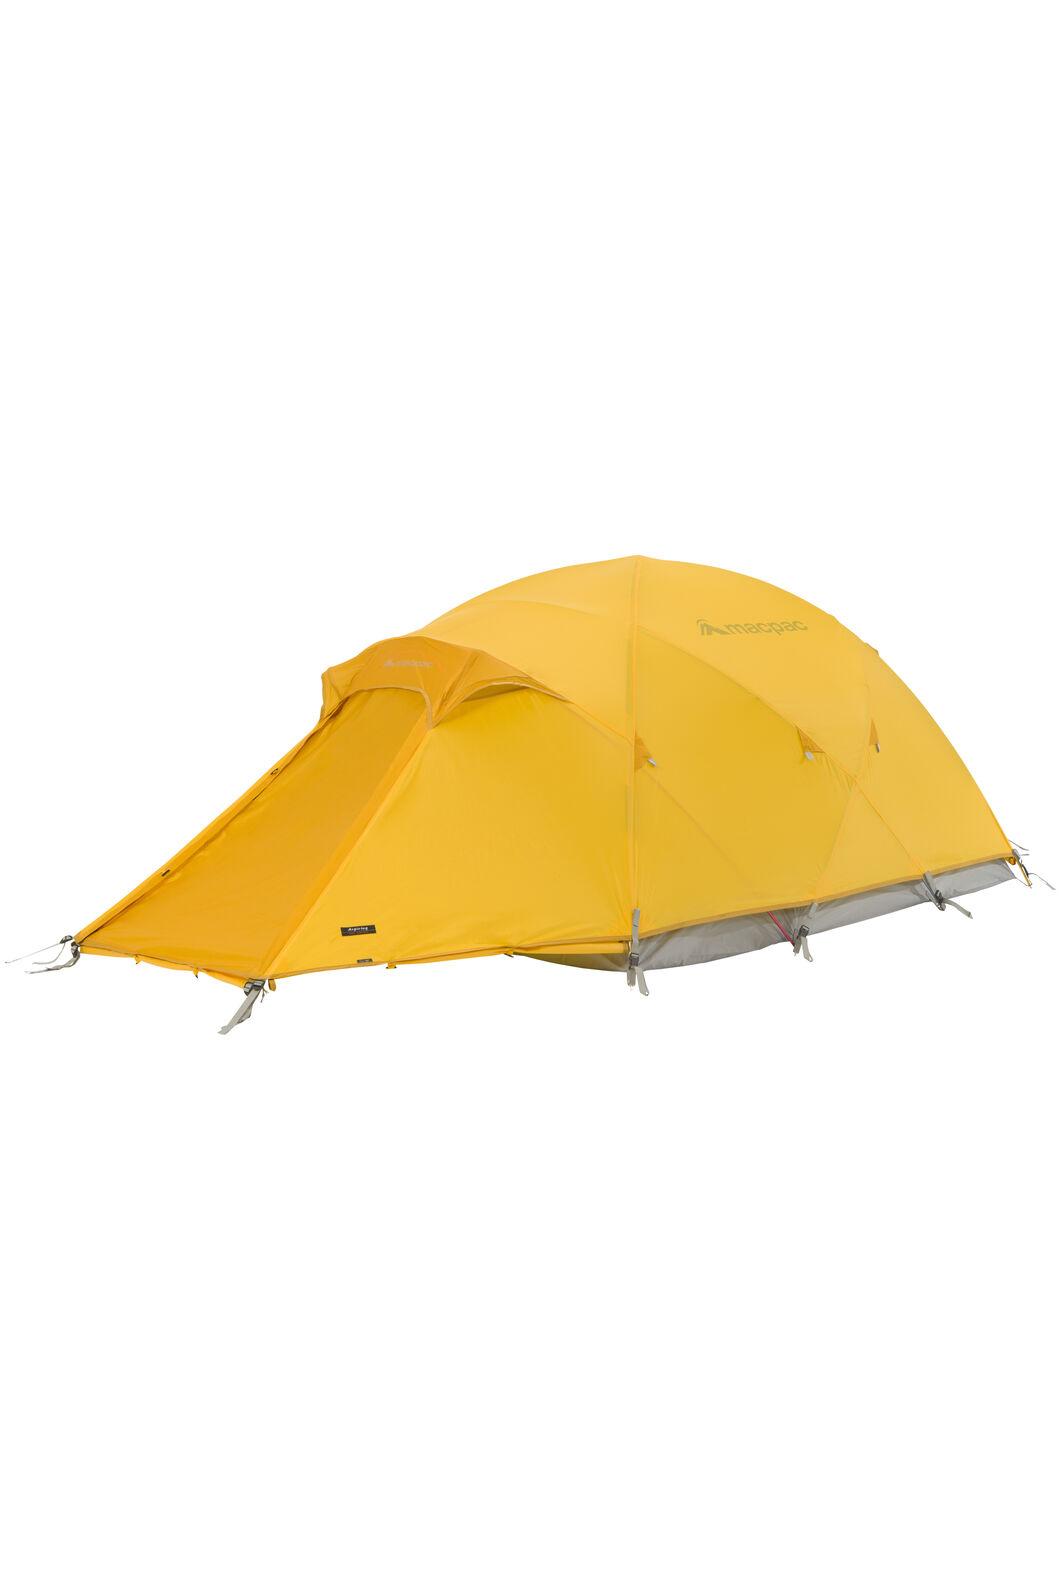 Macpac Aspiring Alpine Tent, Spectra Yellow, hi-res